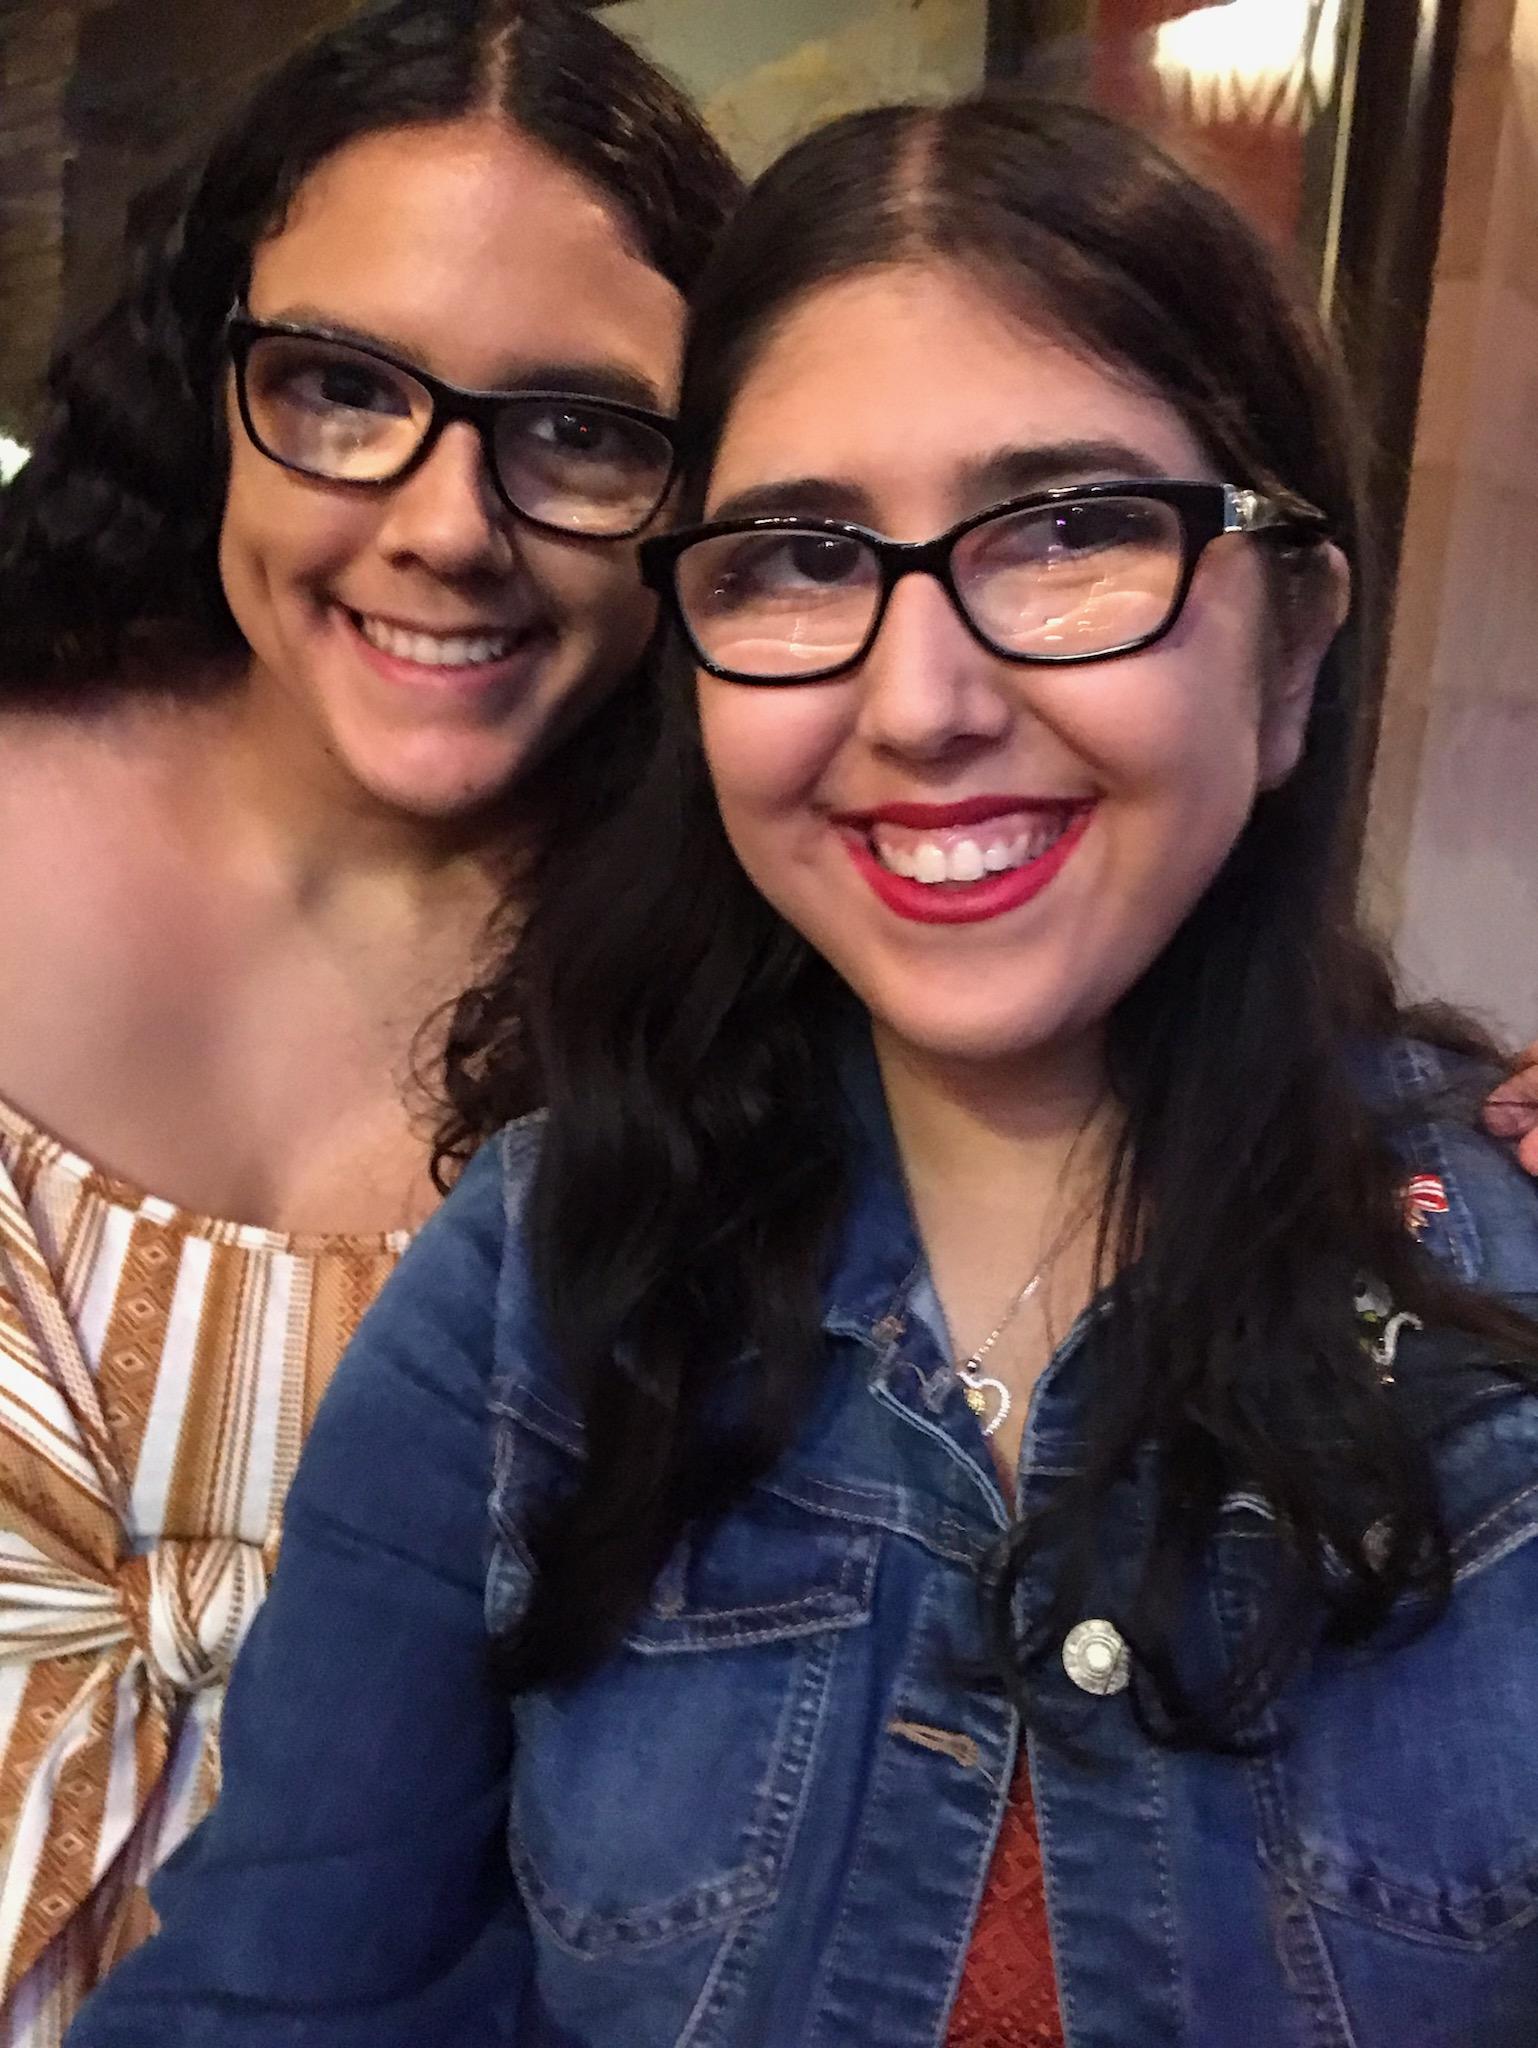 Nicole and Melanie Villarrubia Mendez